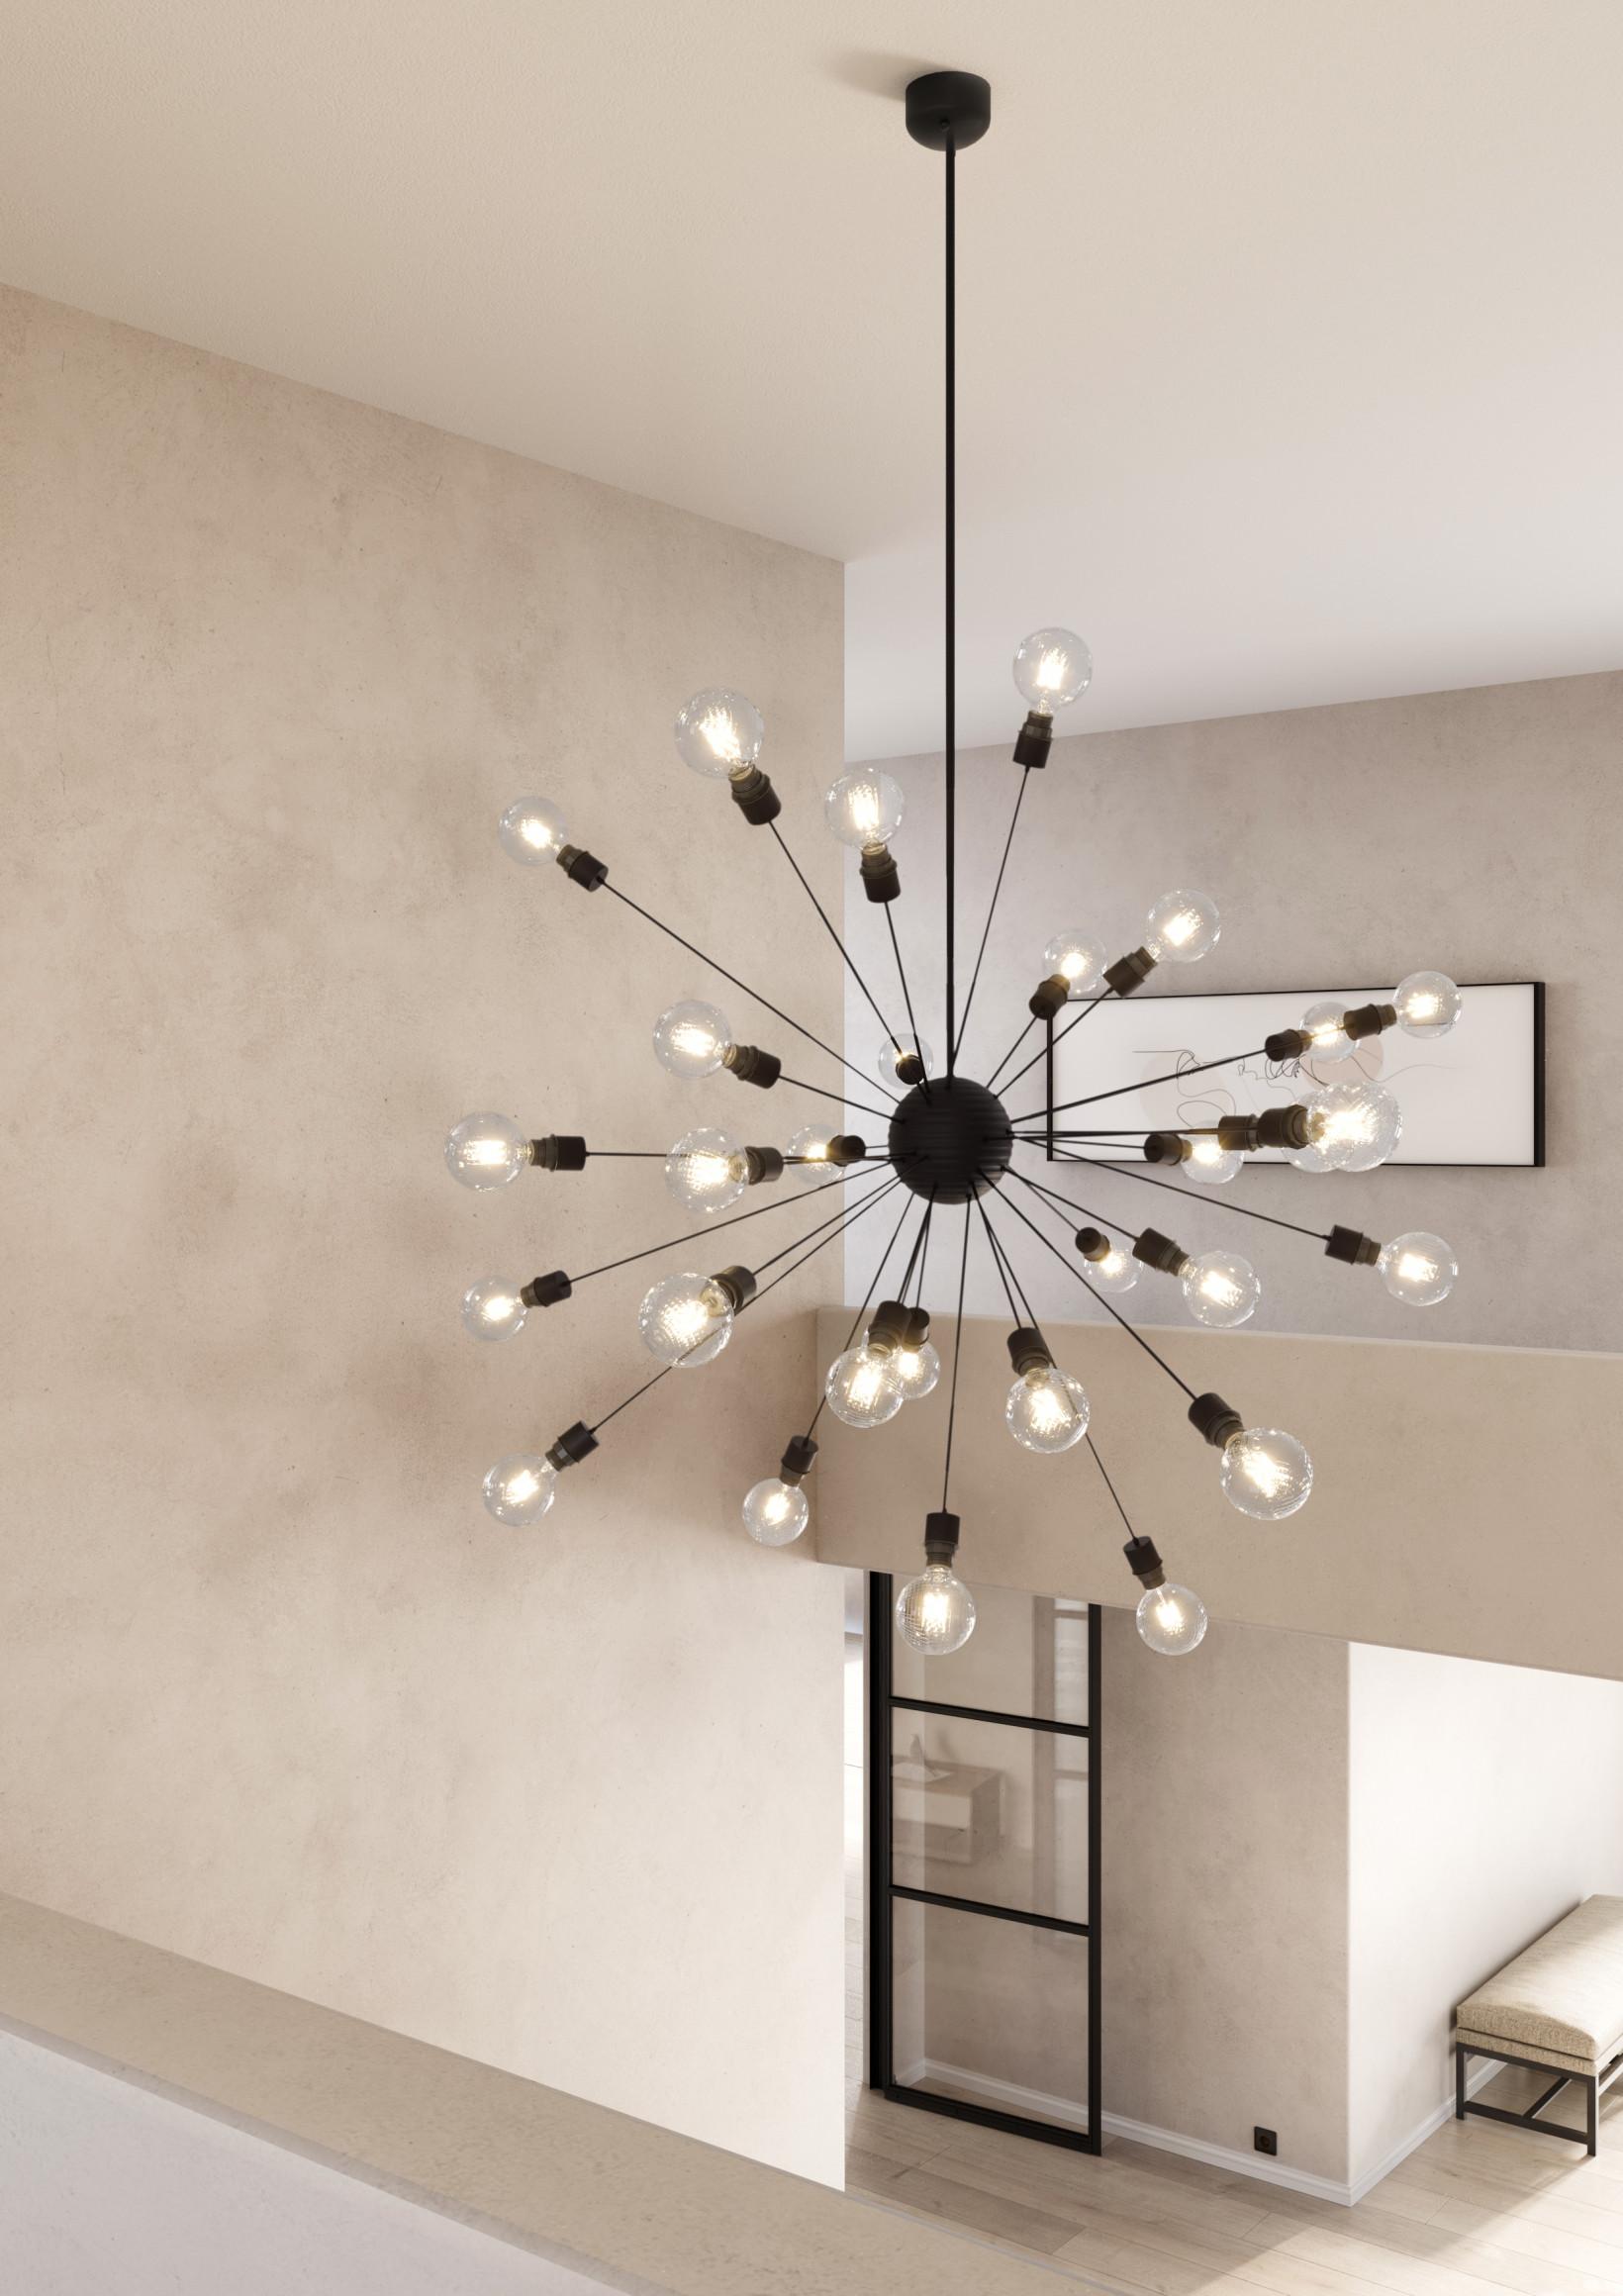 PSM_Lampen_HALL LAMP 8 POST.jpg